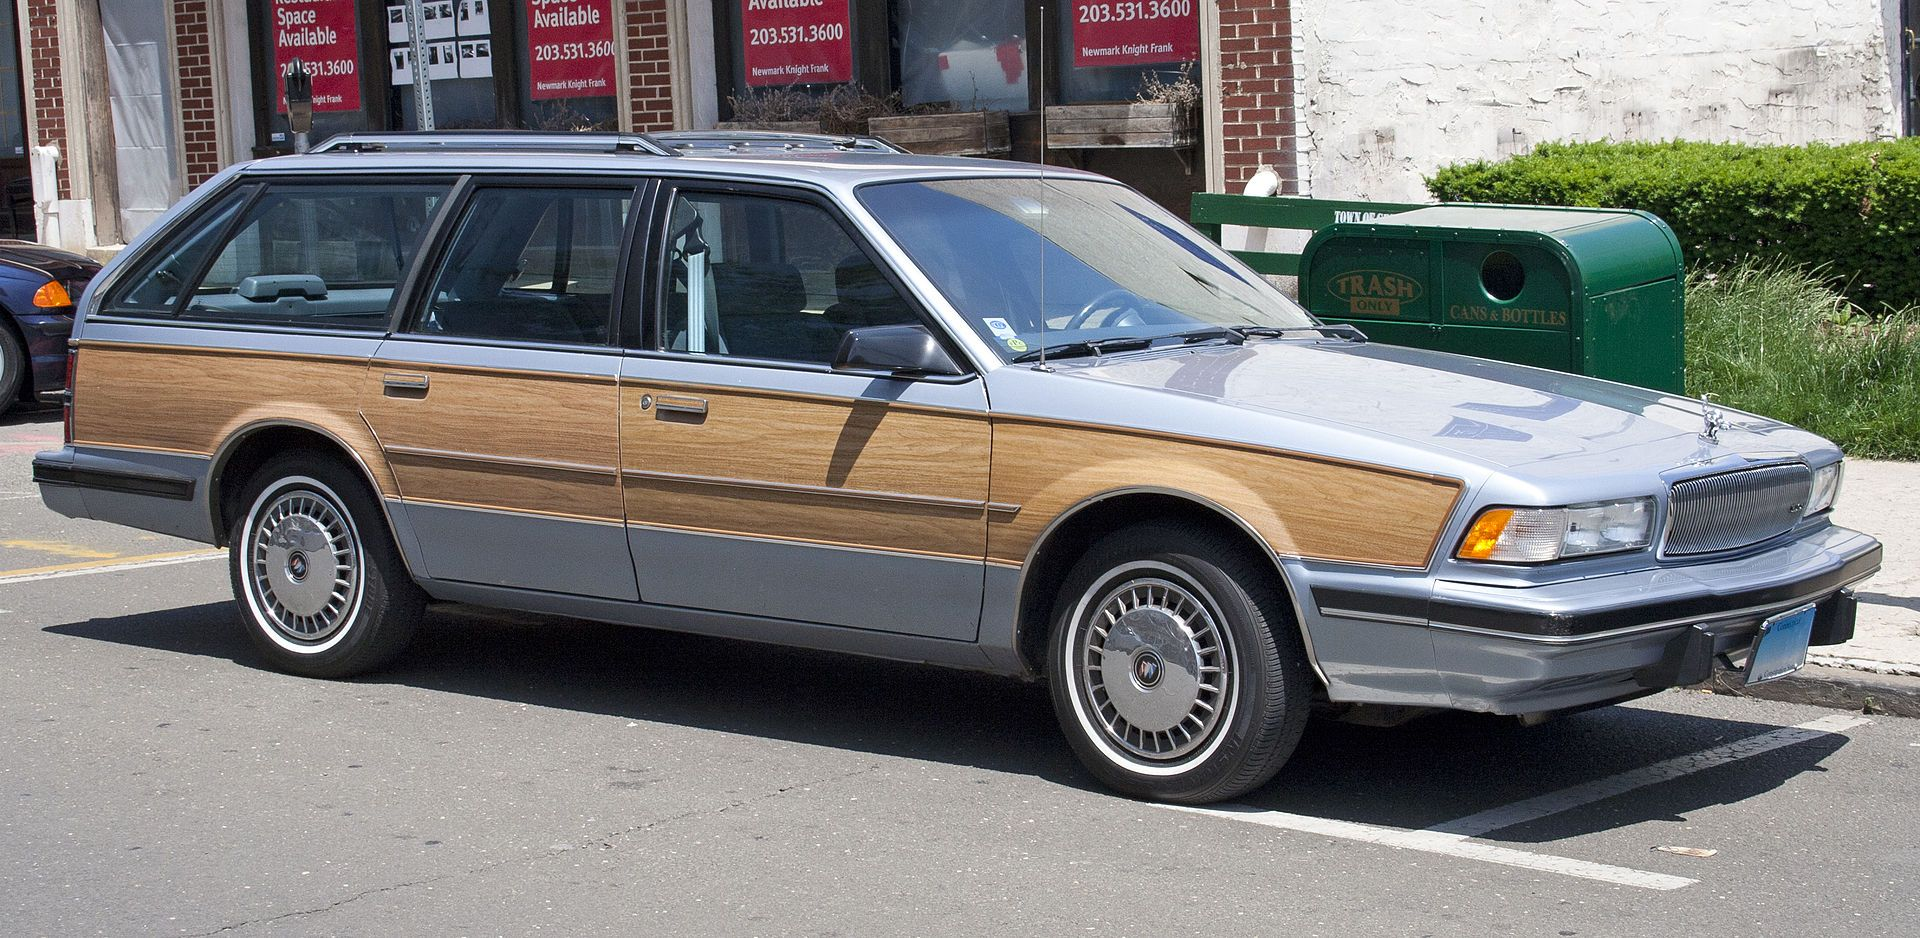 94 96 buick century wagon buick wikipedia classic cars chevy station wagon buick classic cars chevy station wagon buick